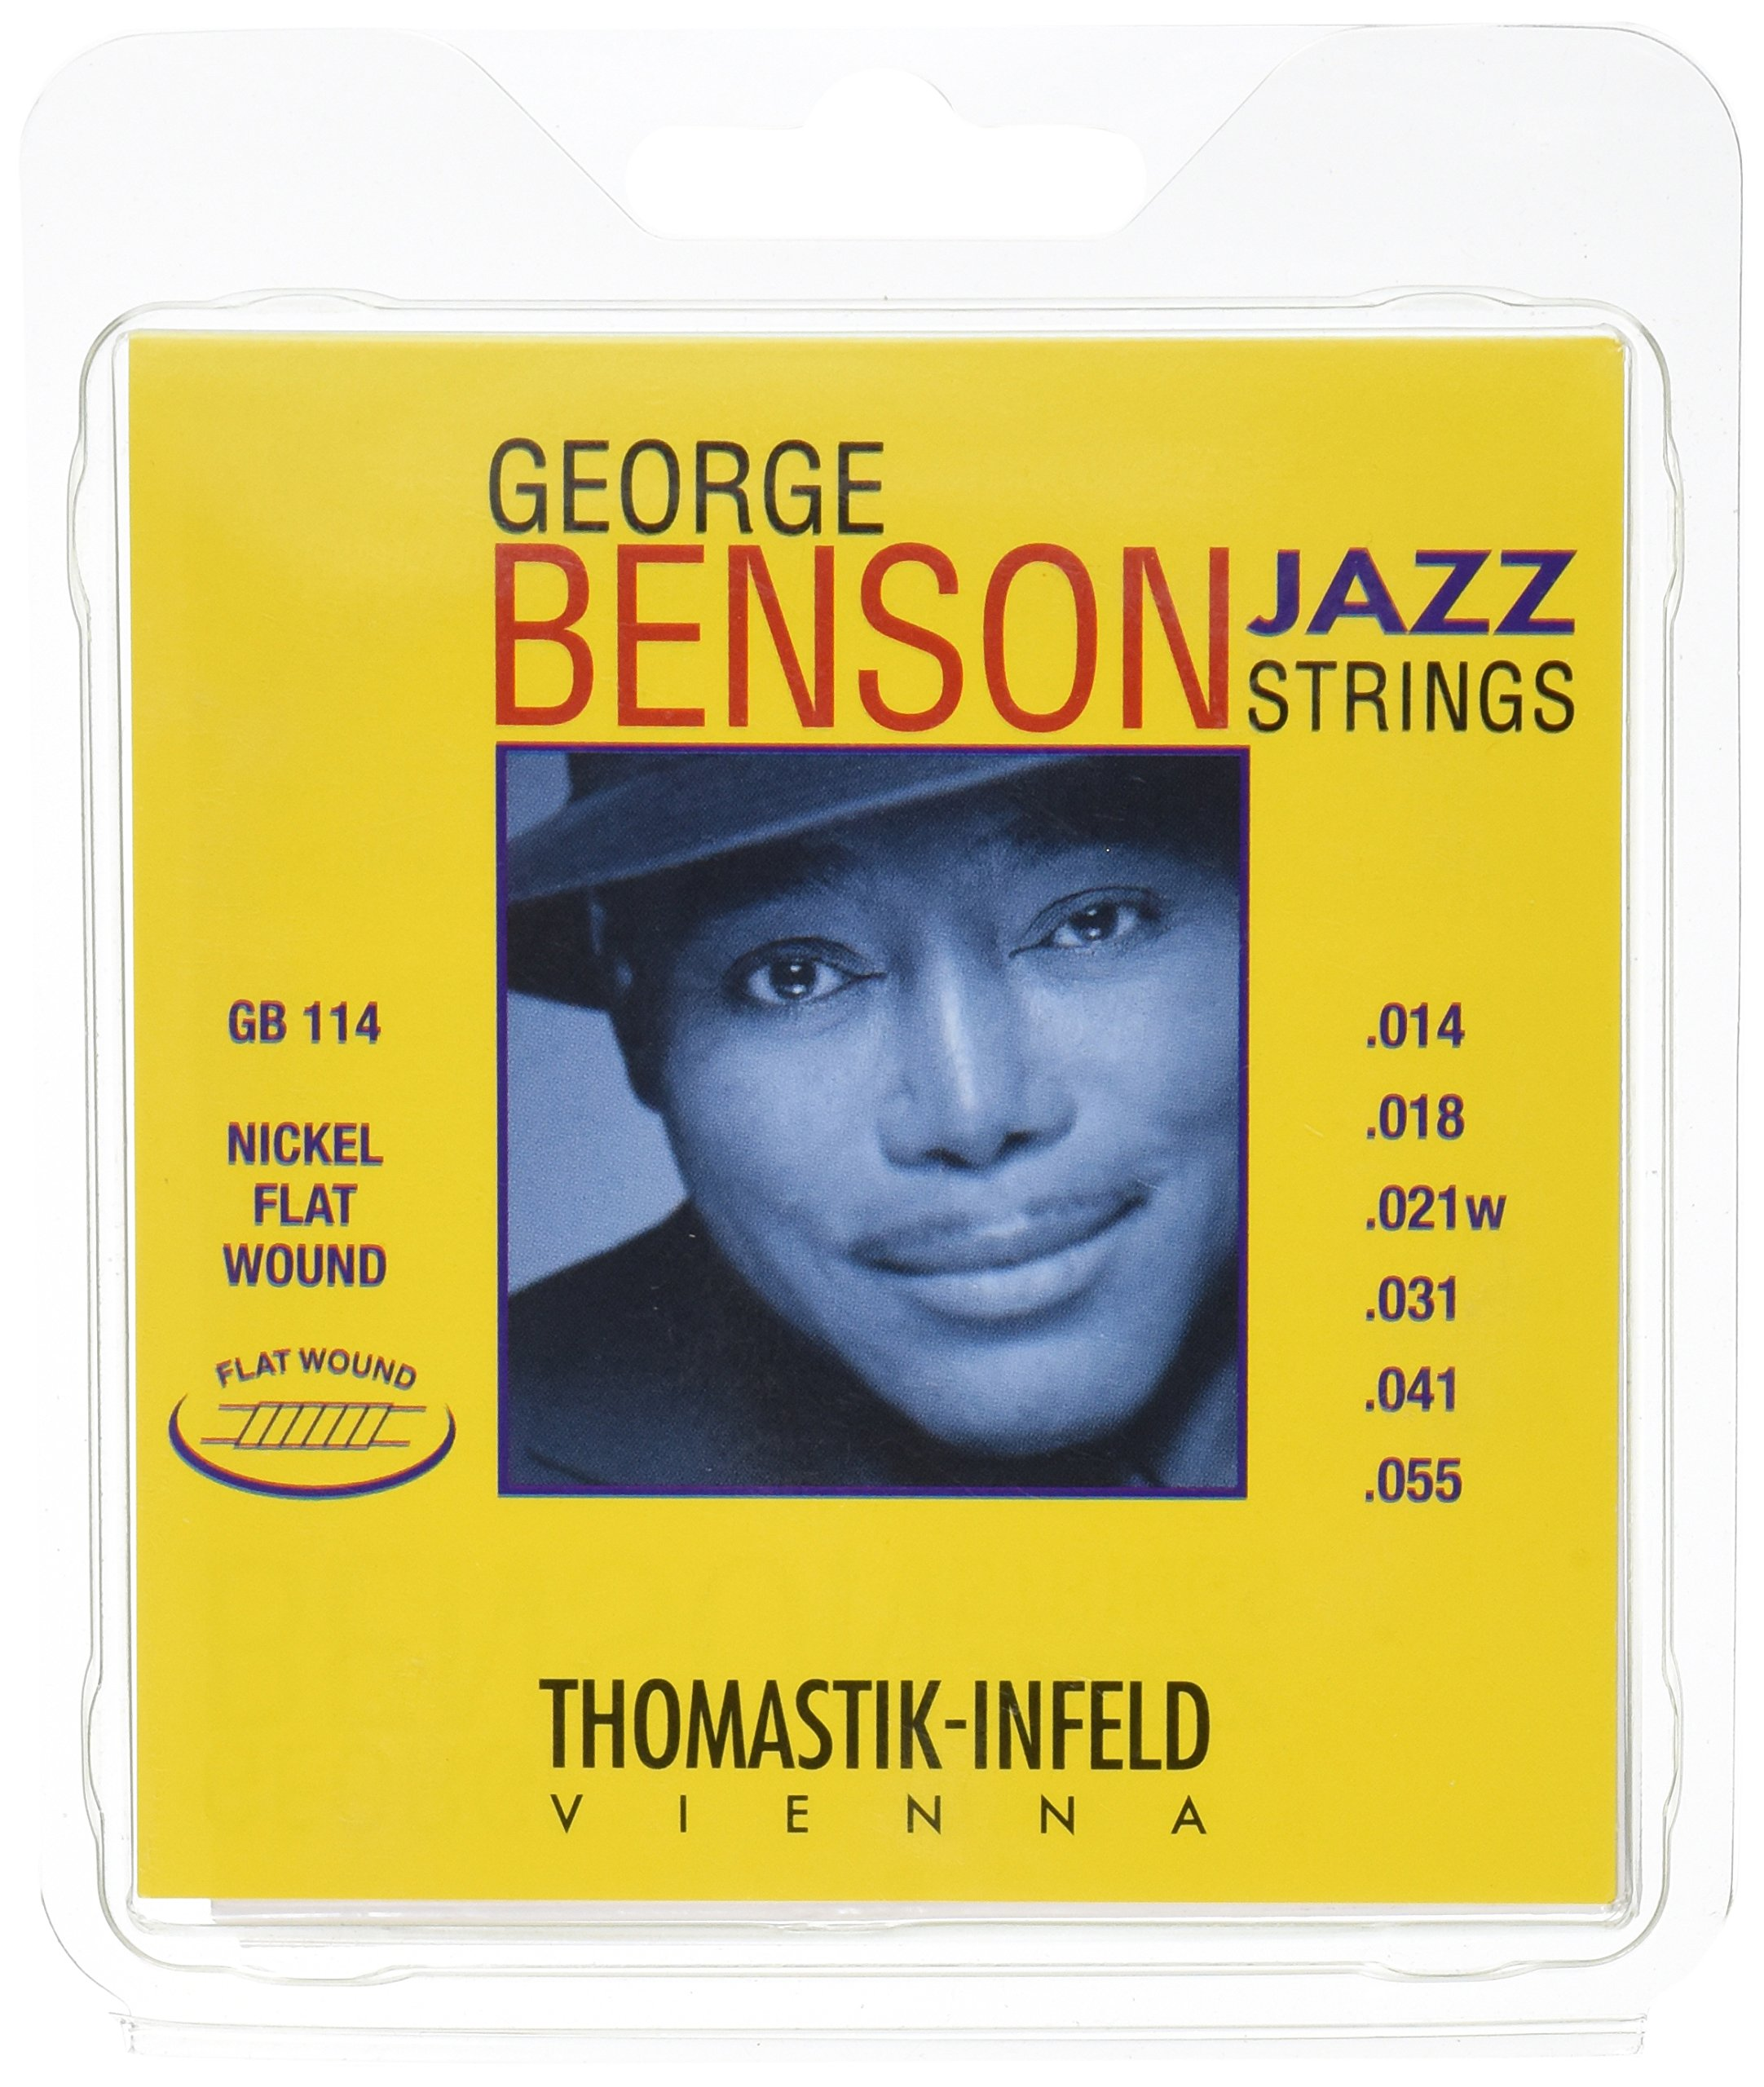 Thomastik-Infeld GB114 Jazz Guitar Strings: George Benson 6 String Set - Pure Nickel Flat Wounds E, B, G, D, A, E Set